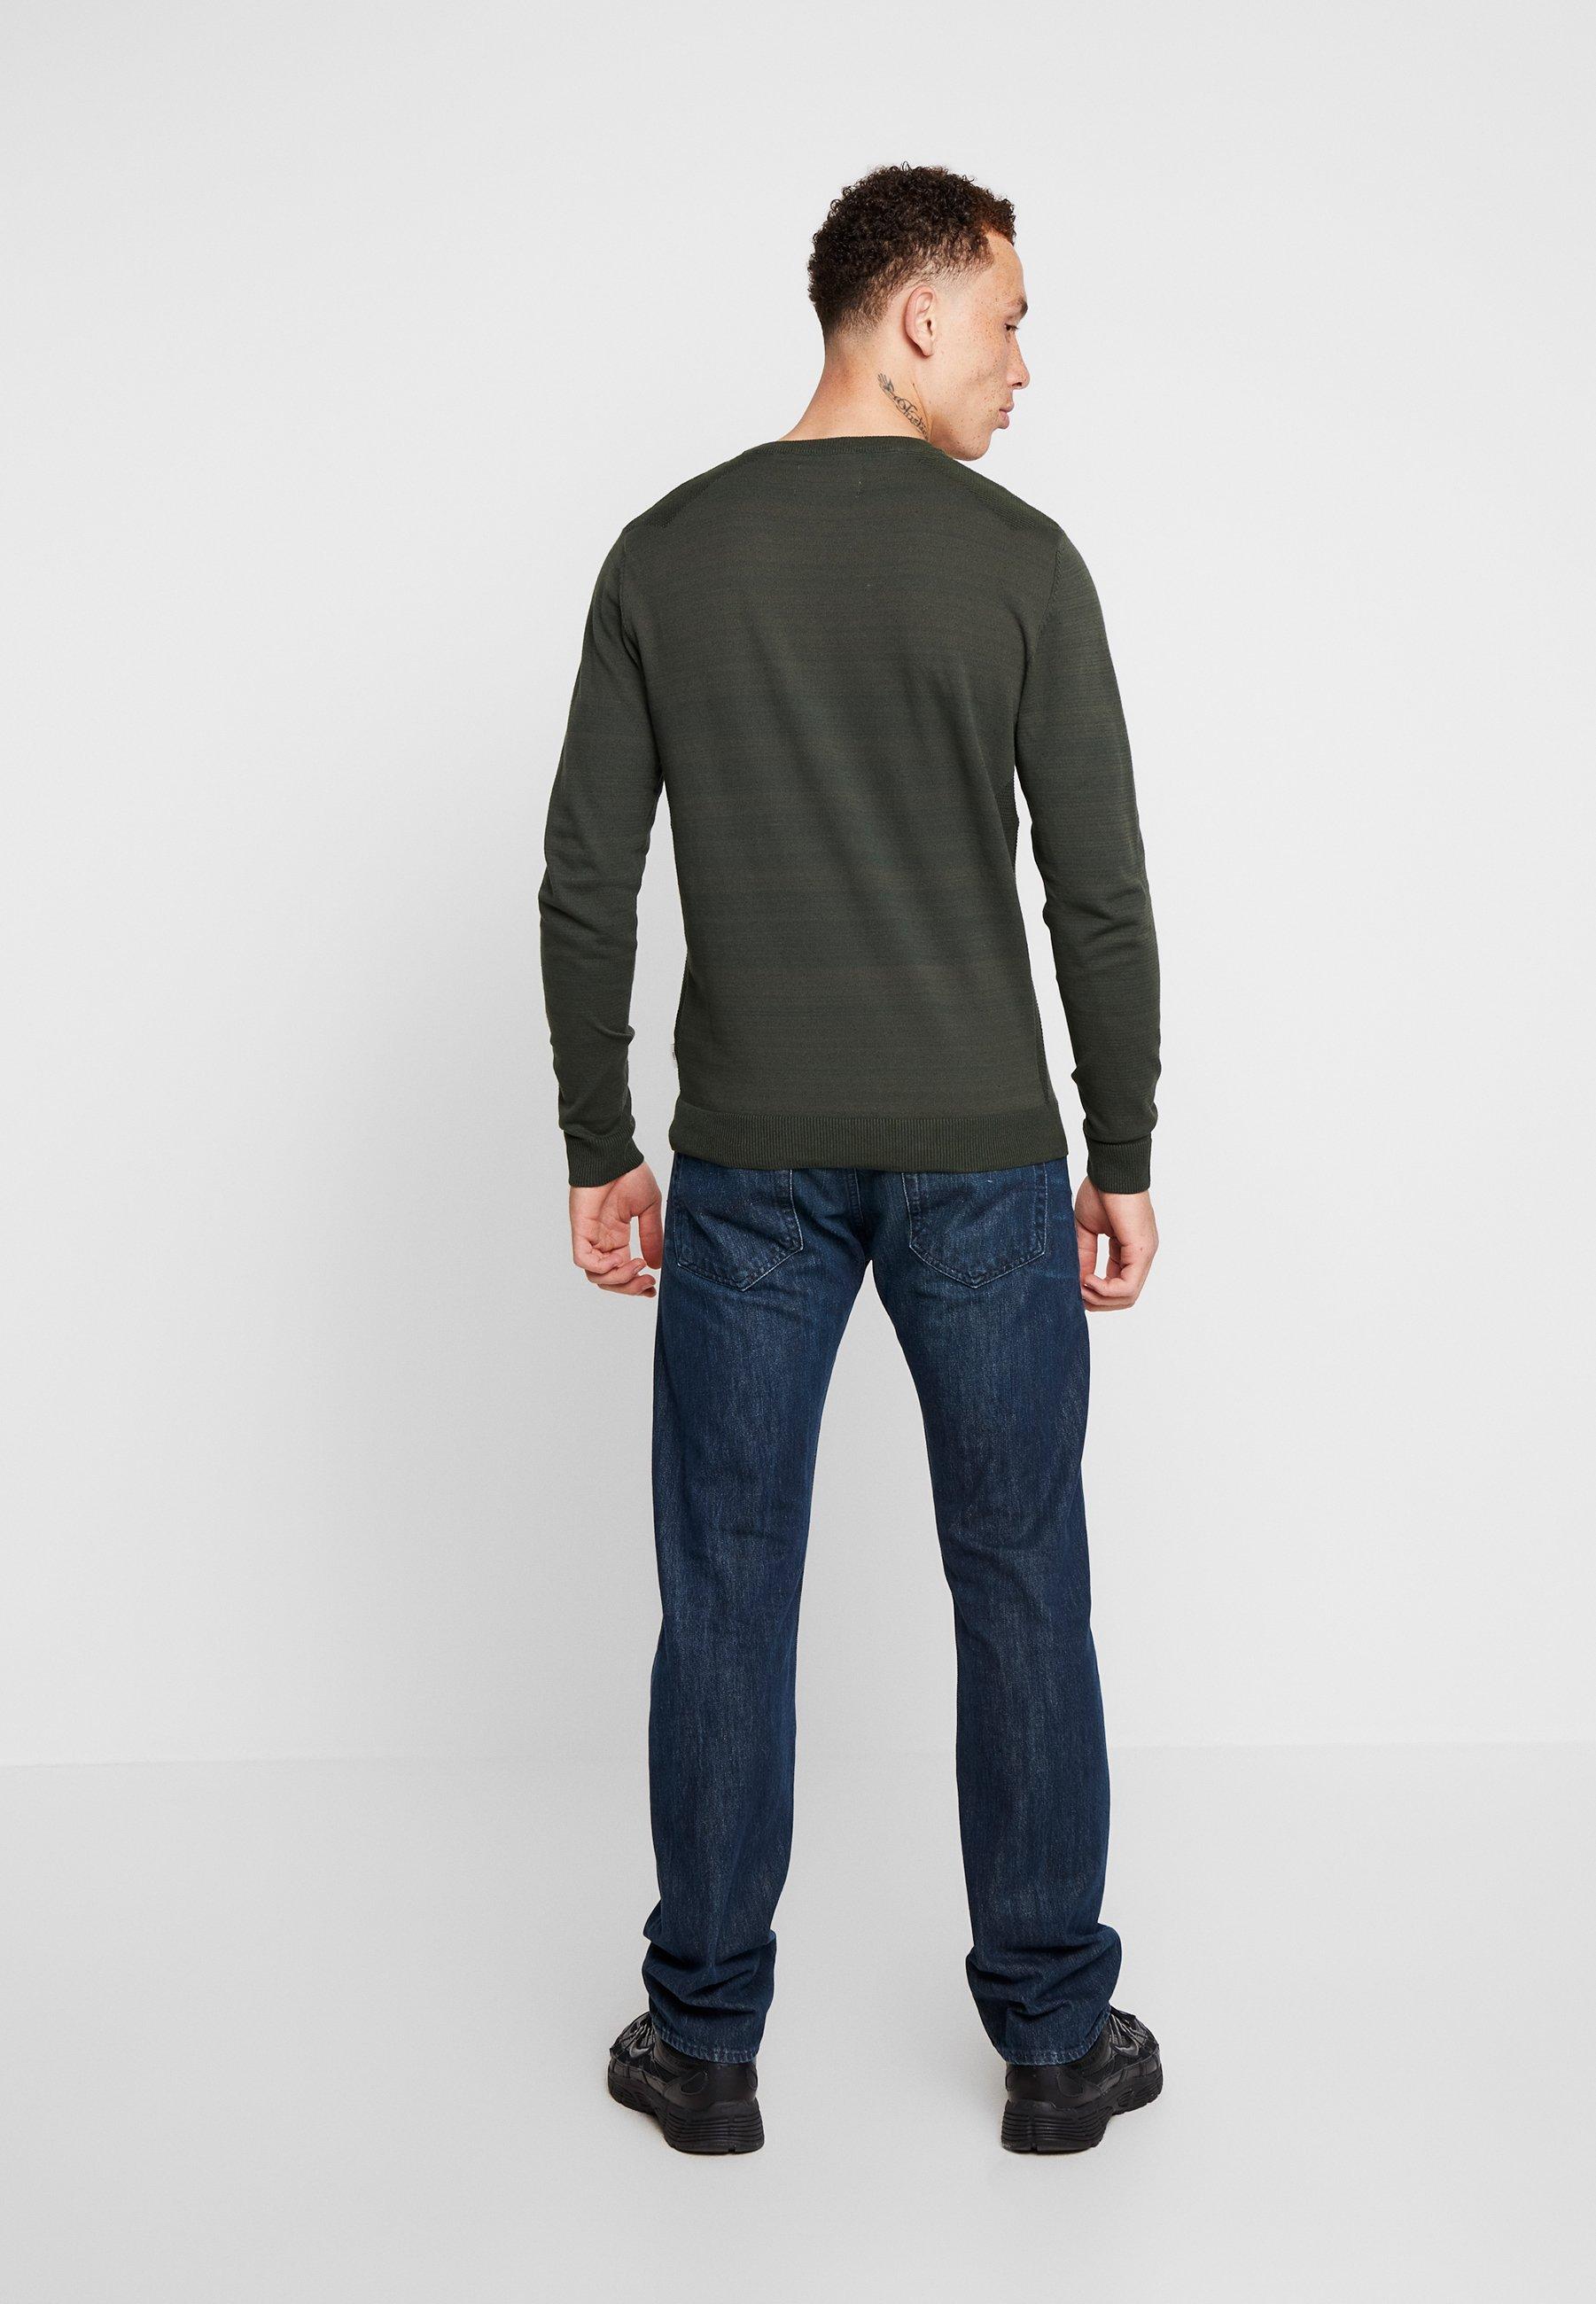 Levi's® 501® Levi's®original Fit - Straight Leg Jeans Fever Sr6j21Xd HWV1Q2xc